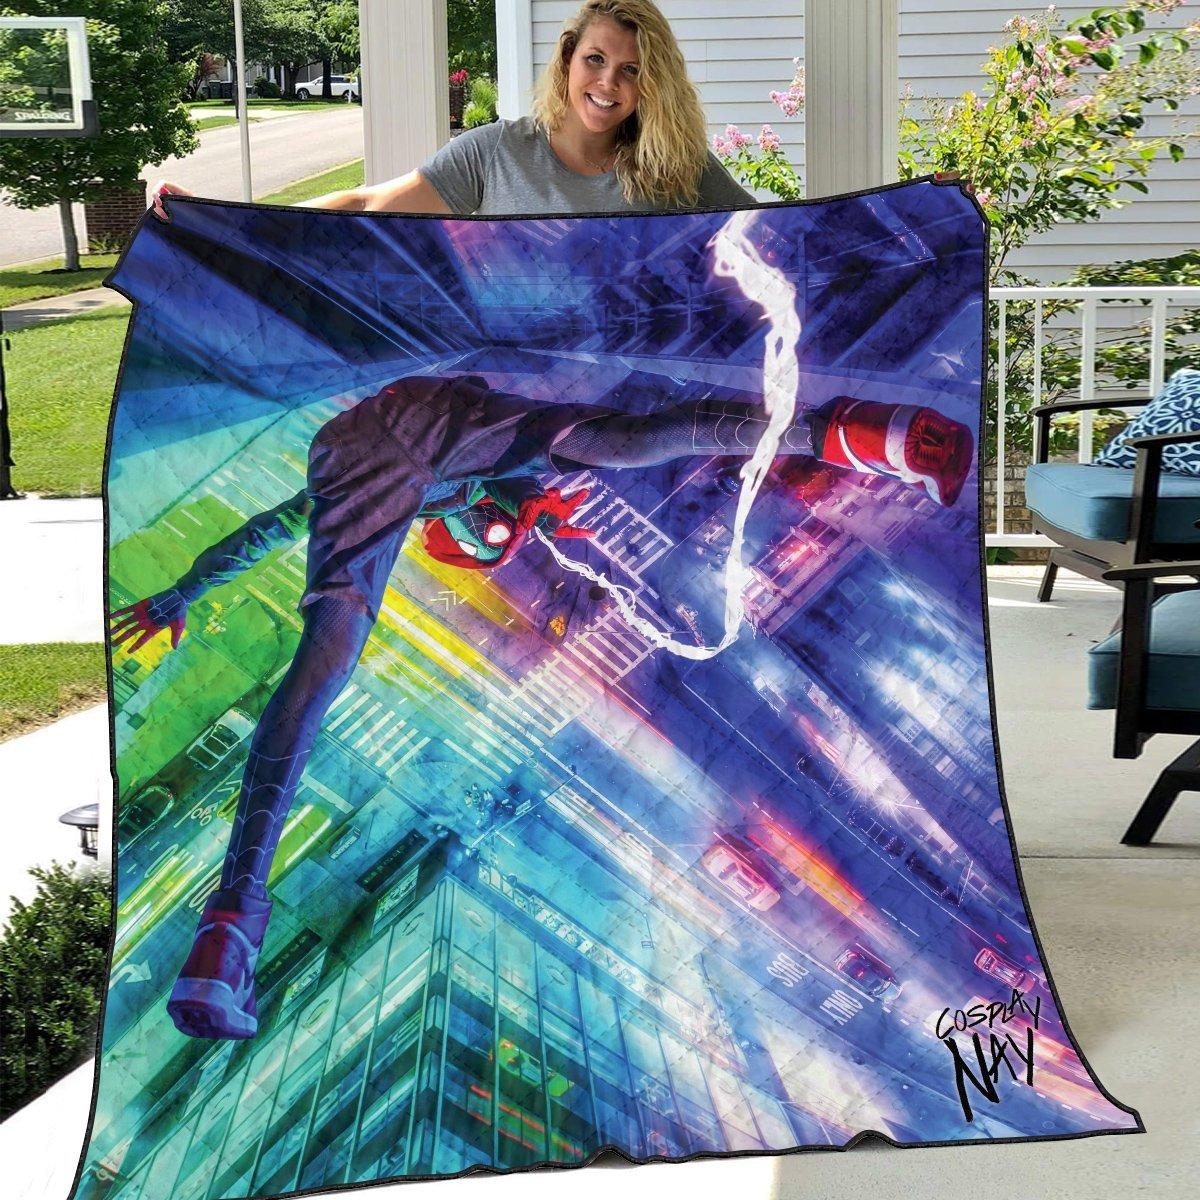 web slinger miles signed quilt blanket 205354 - Otaku Treat